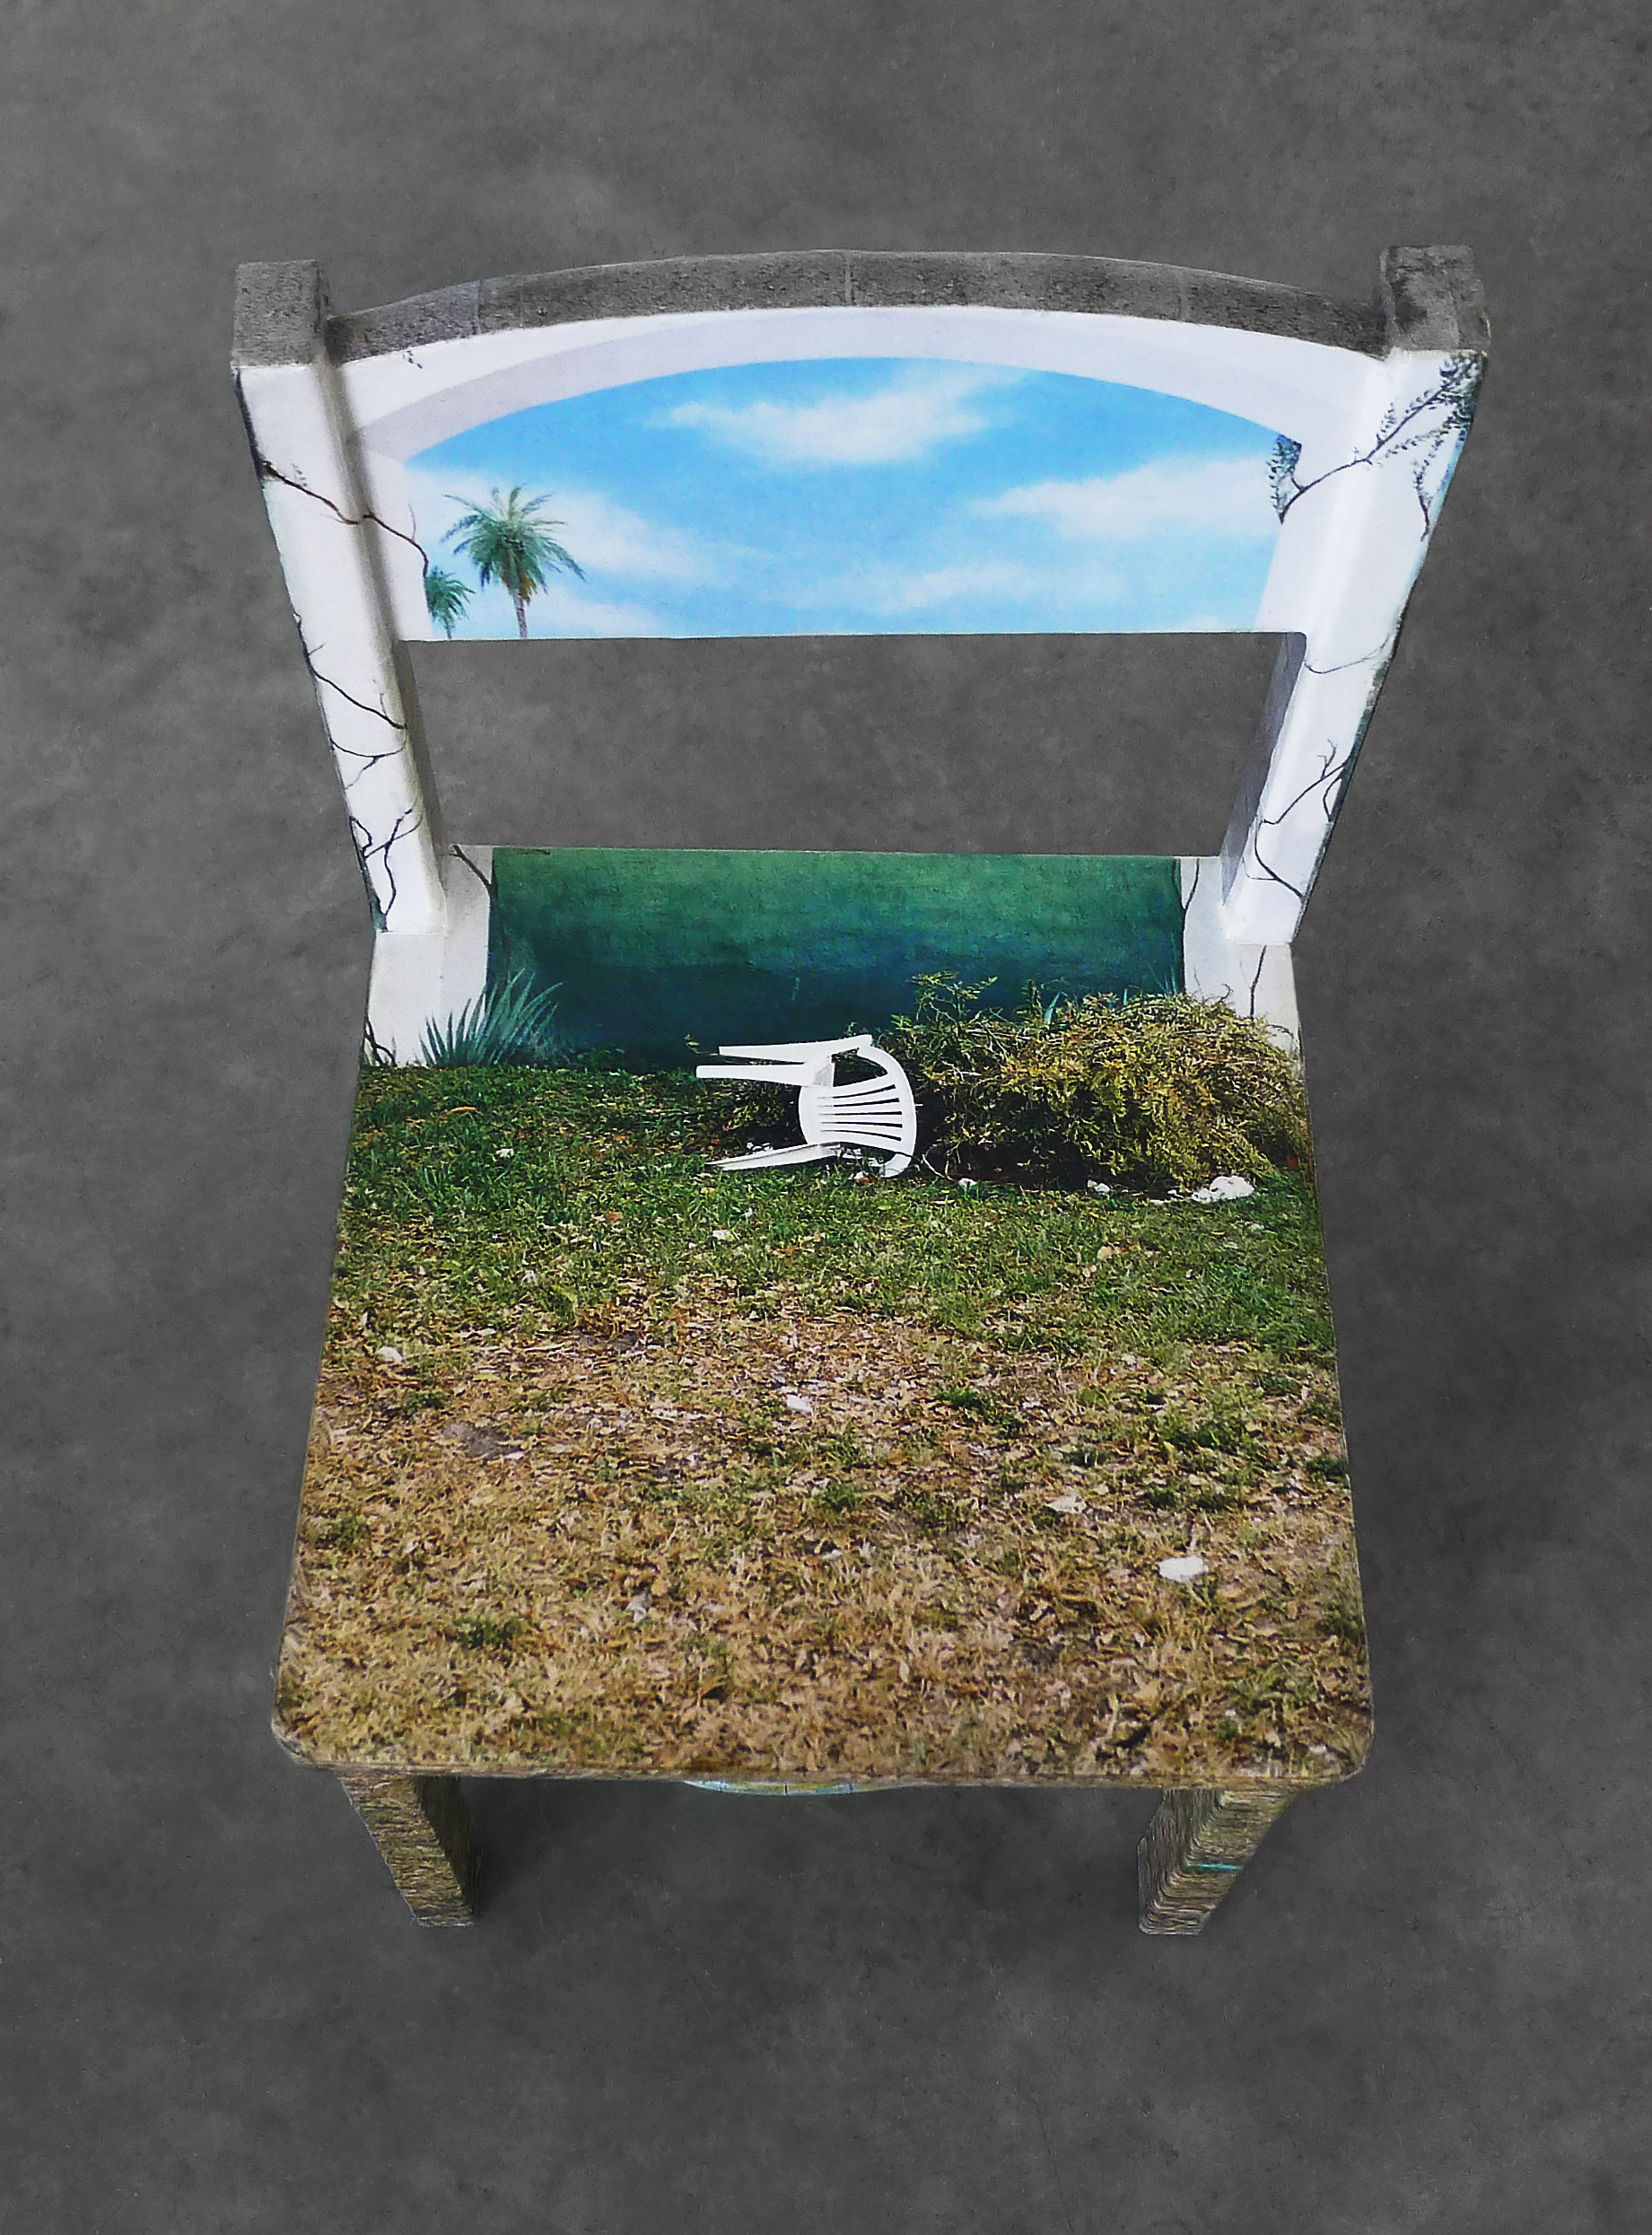 "Chair Mural II , detail, 2014, archival inkjet print, glue, wood chair, inflatable globe, 11""x 11.5""x 21"" (28 cm x 29.2 cm x 53.3 cm)"